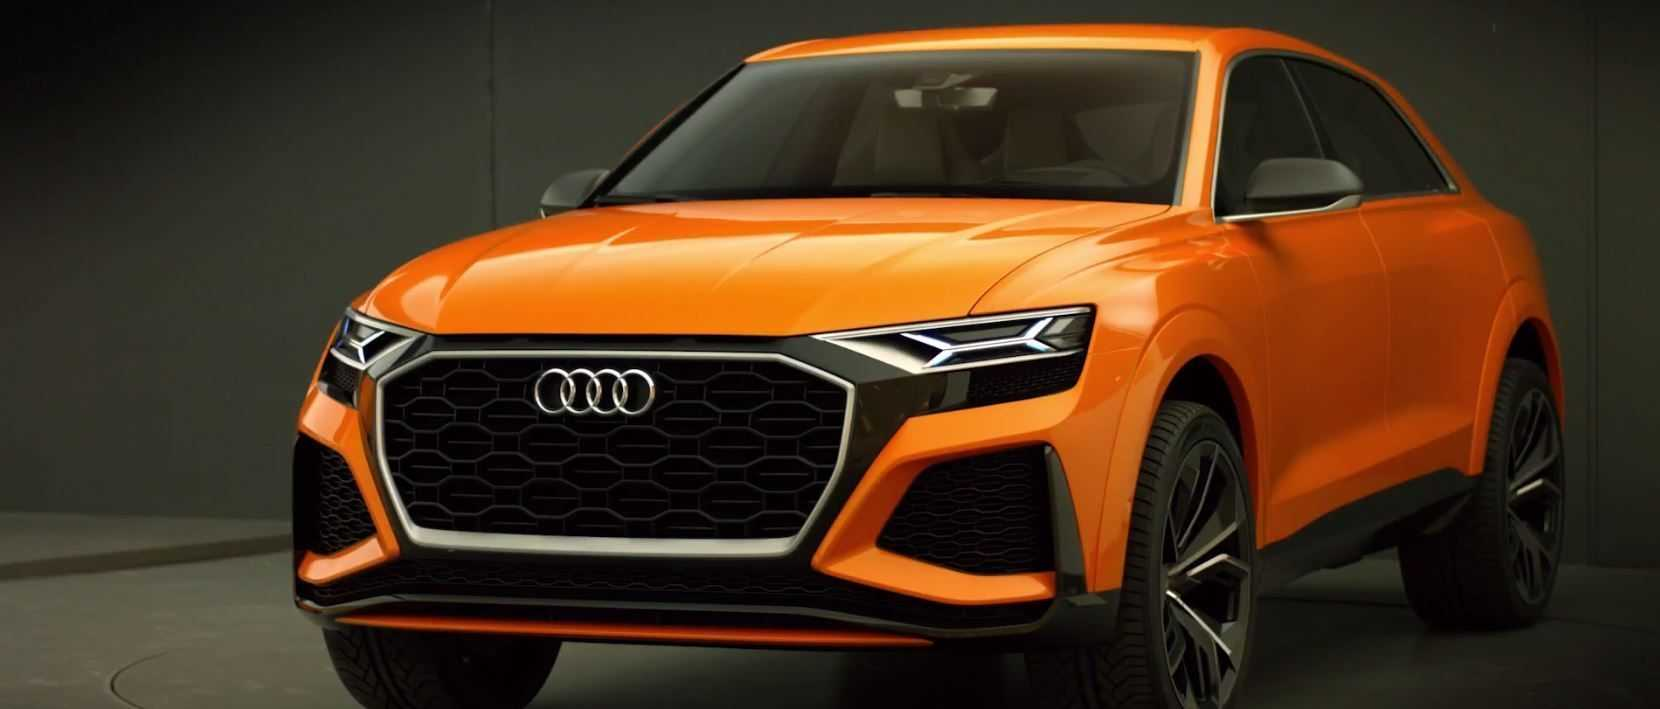 Audi Q8 sport concept 2017